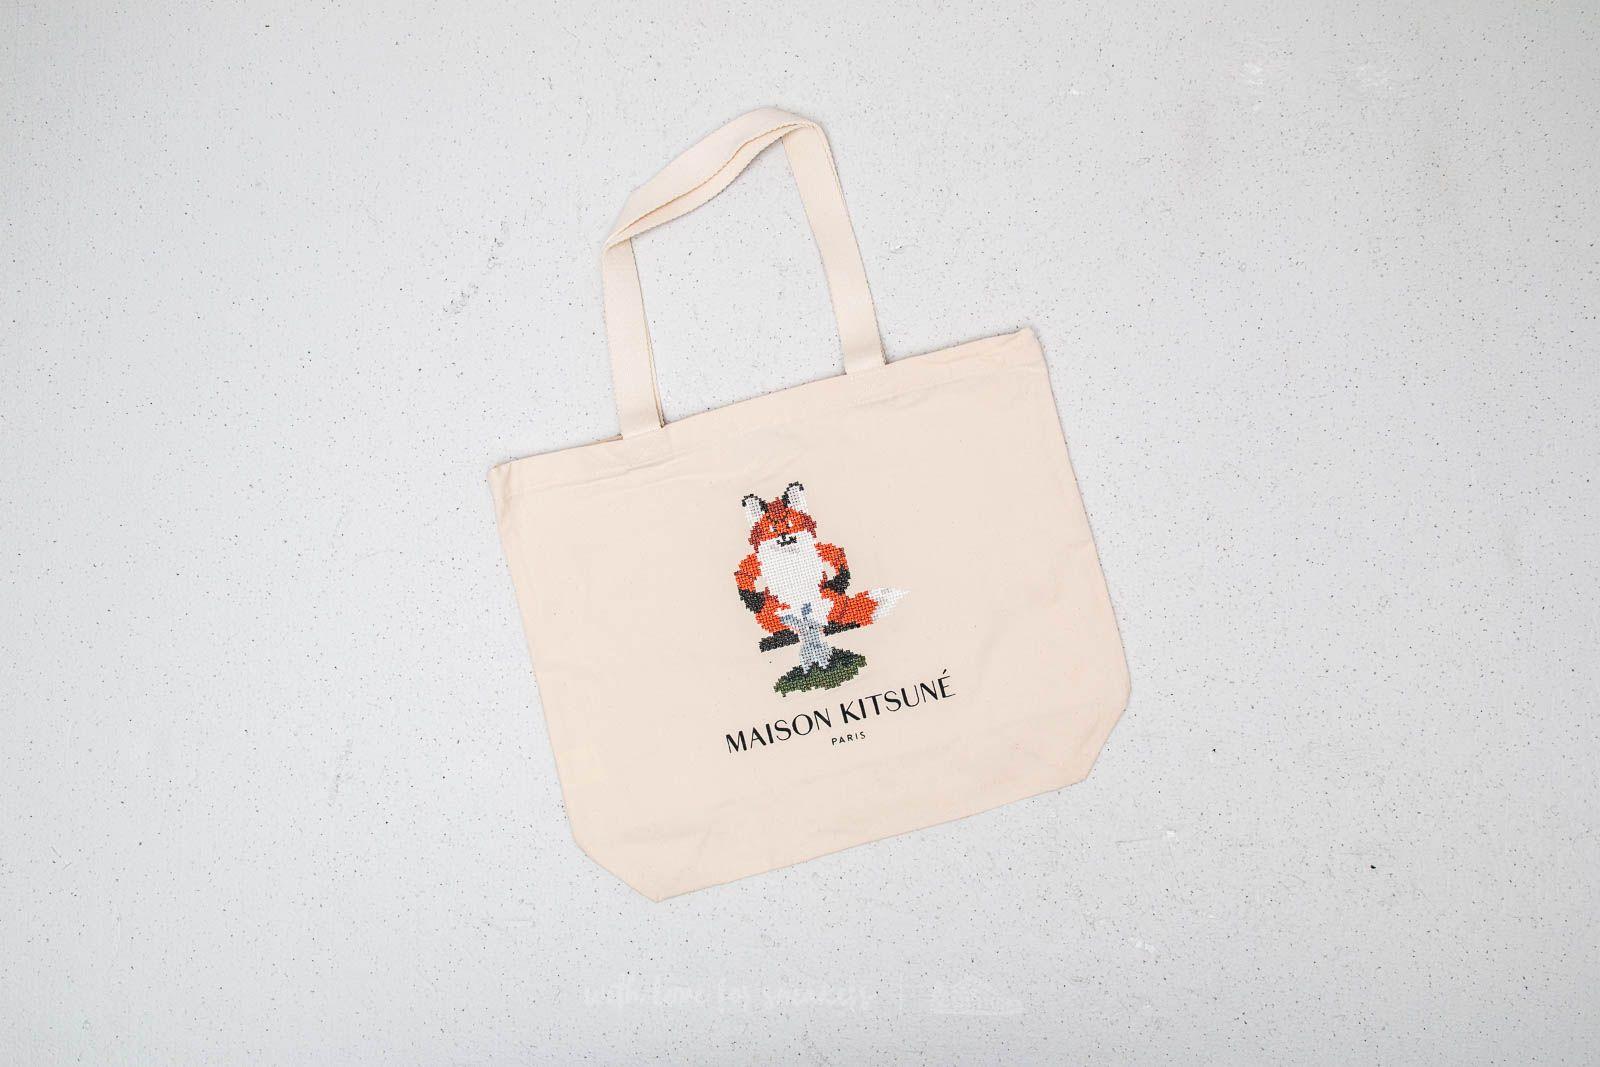 MAISON KITSUNÉ Pixel Tote Bag